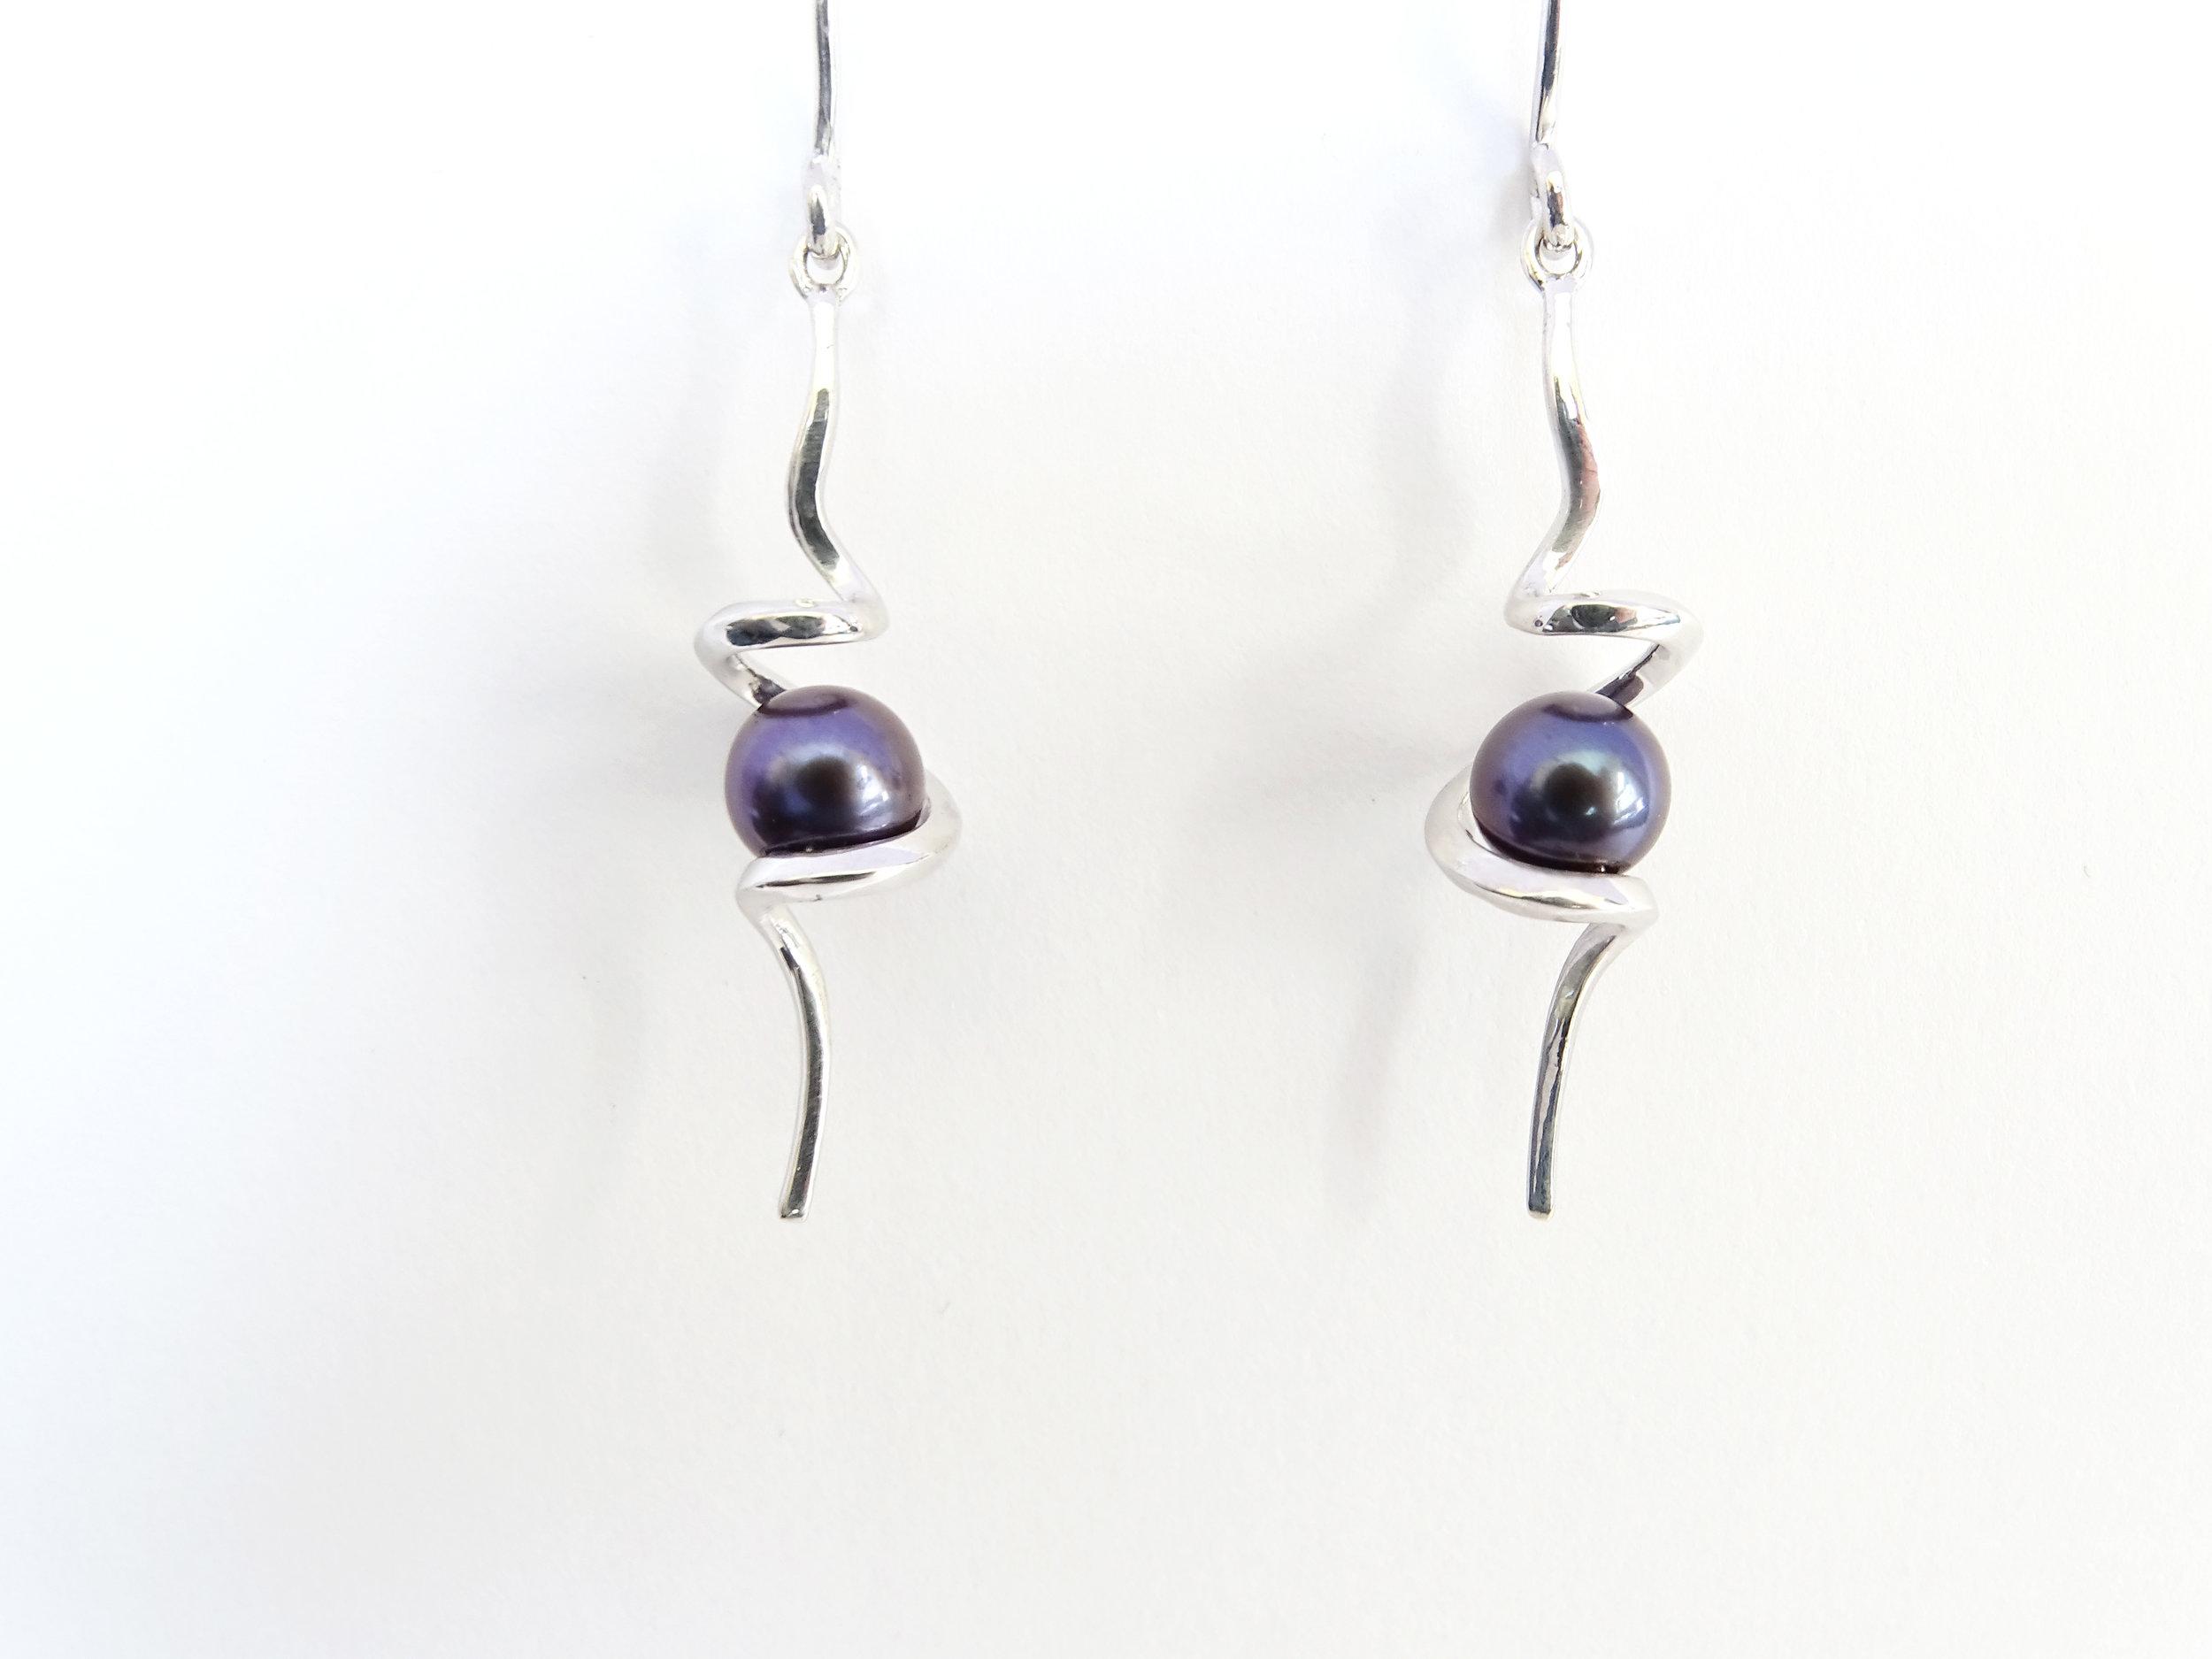 Black pearl earring hooks